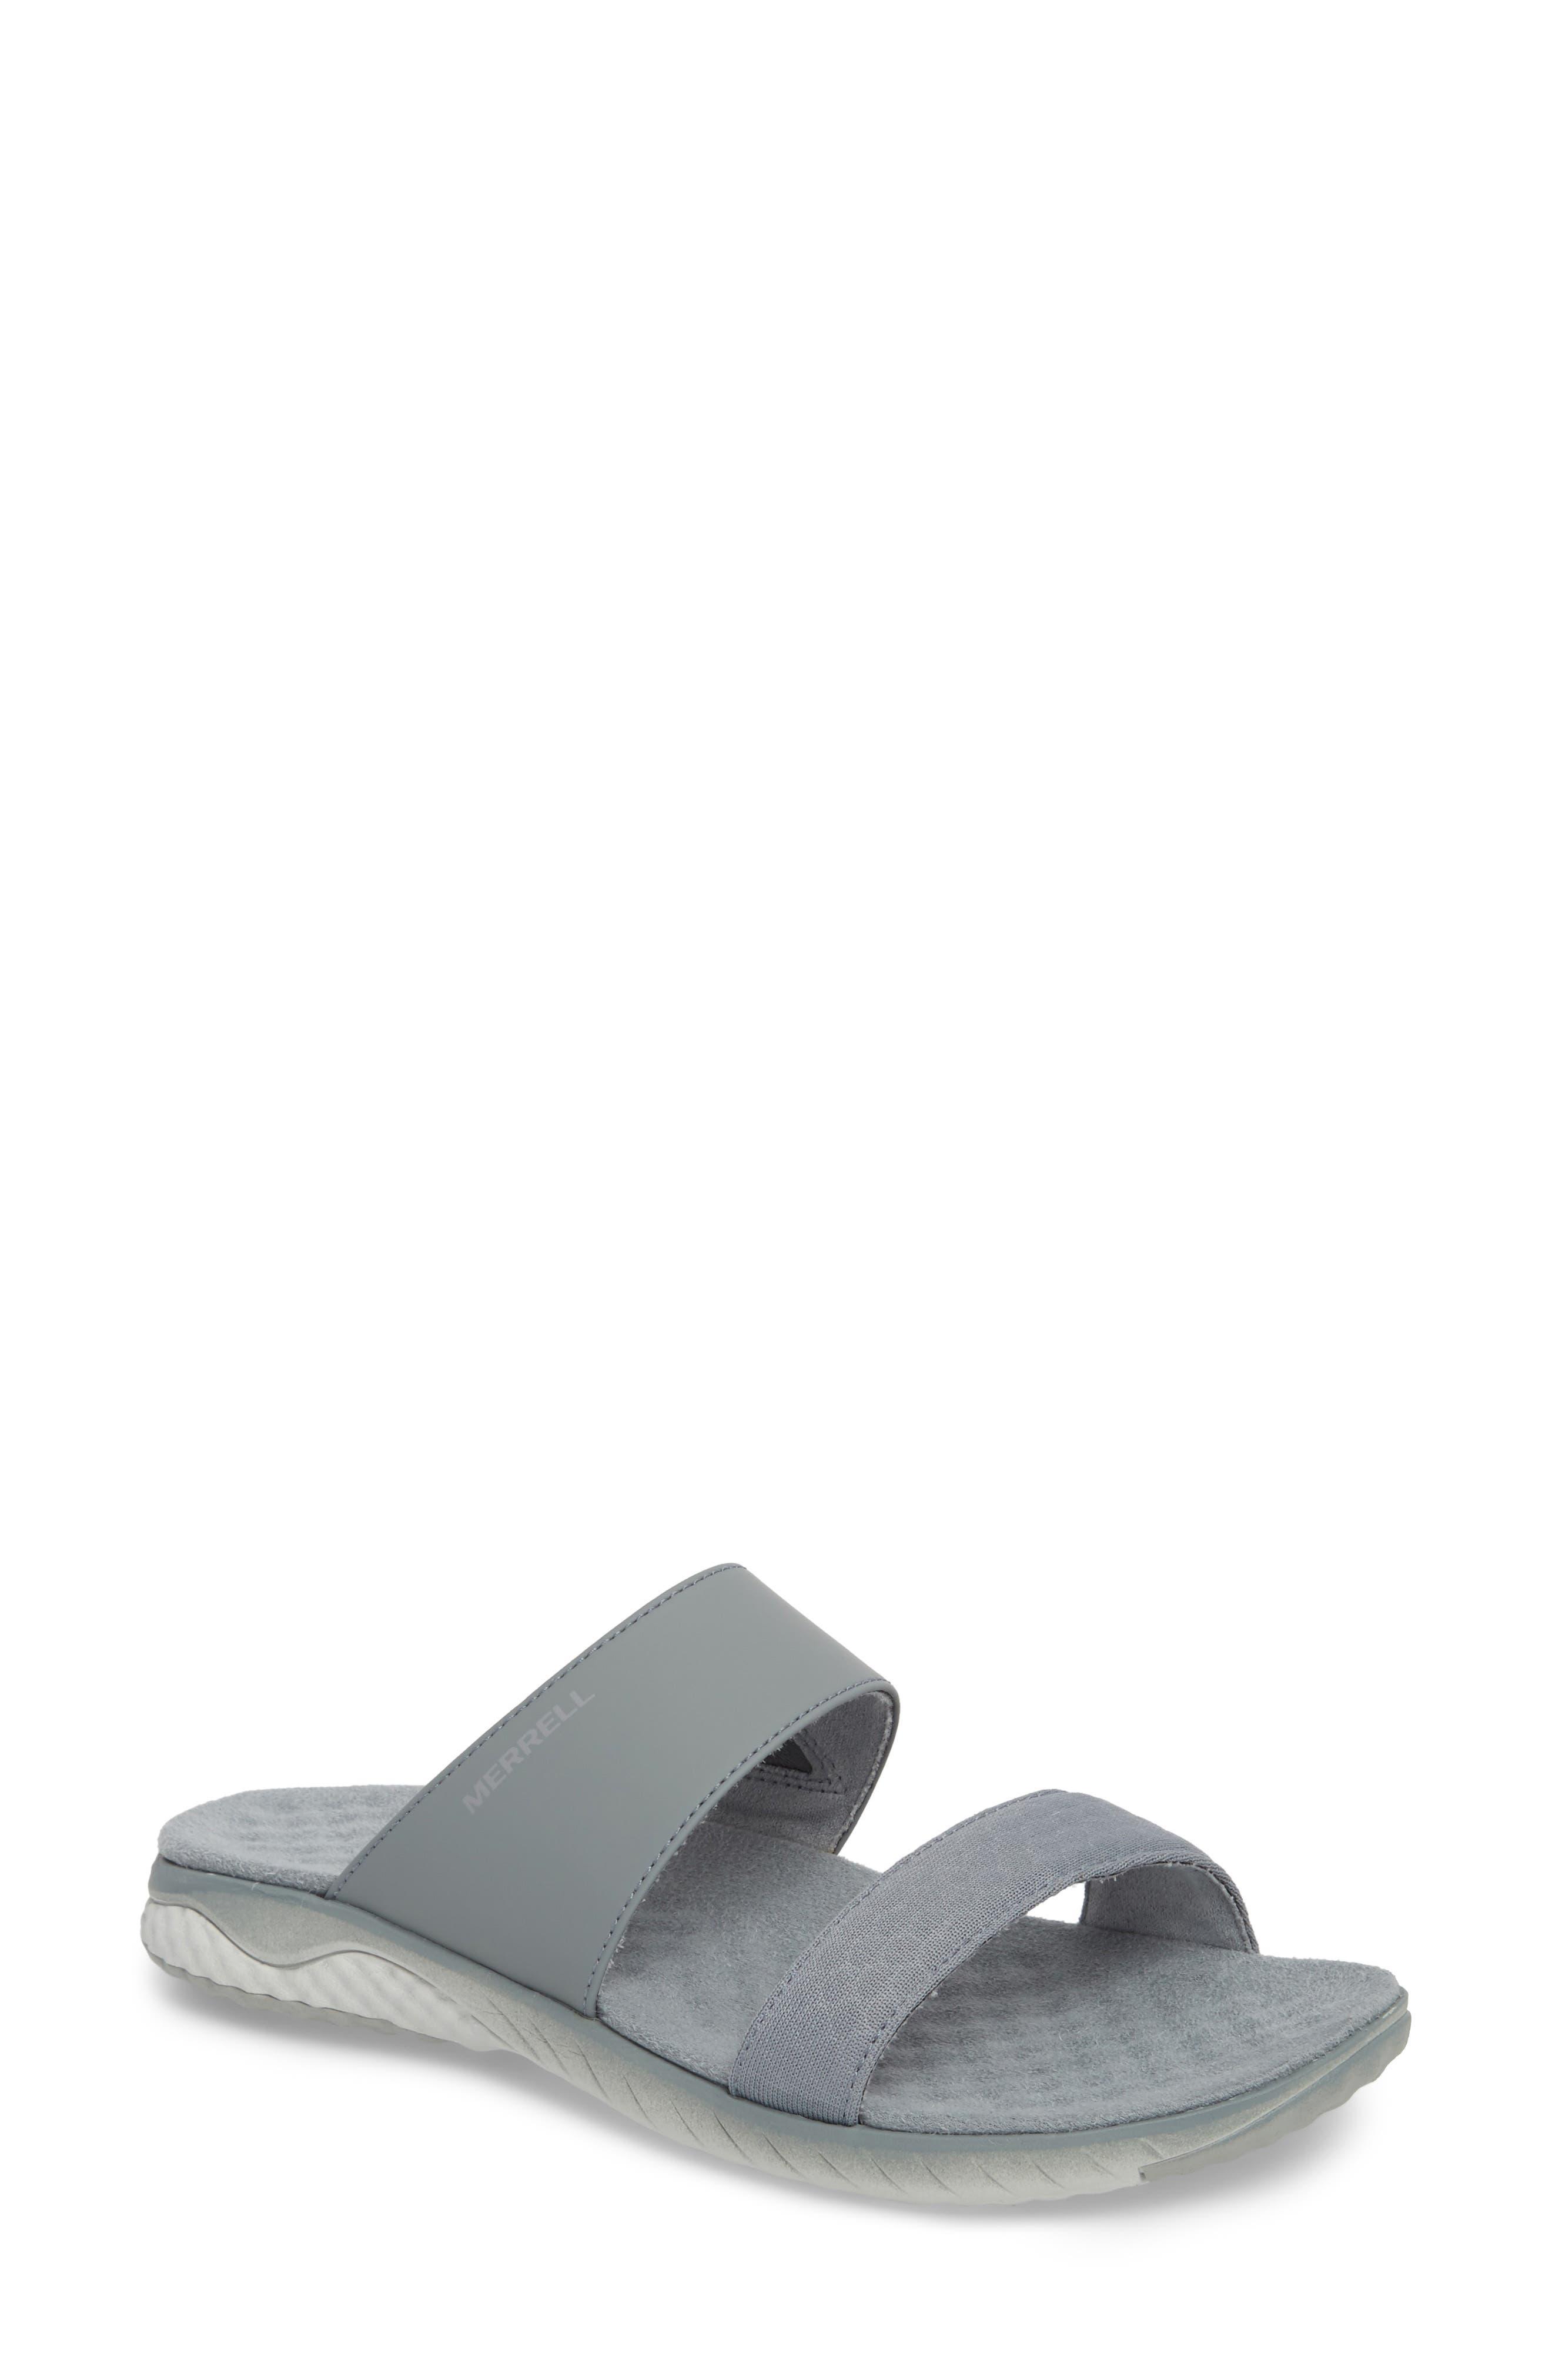 Merrell 1SIX8 Linna Air Cushion+ Slide Sandal (Women)